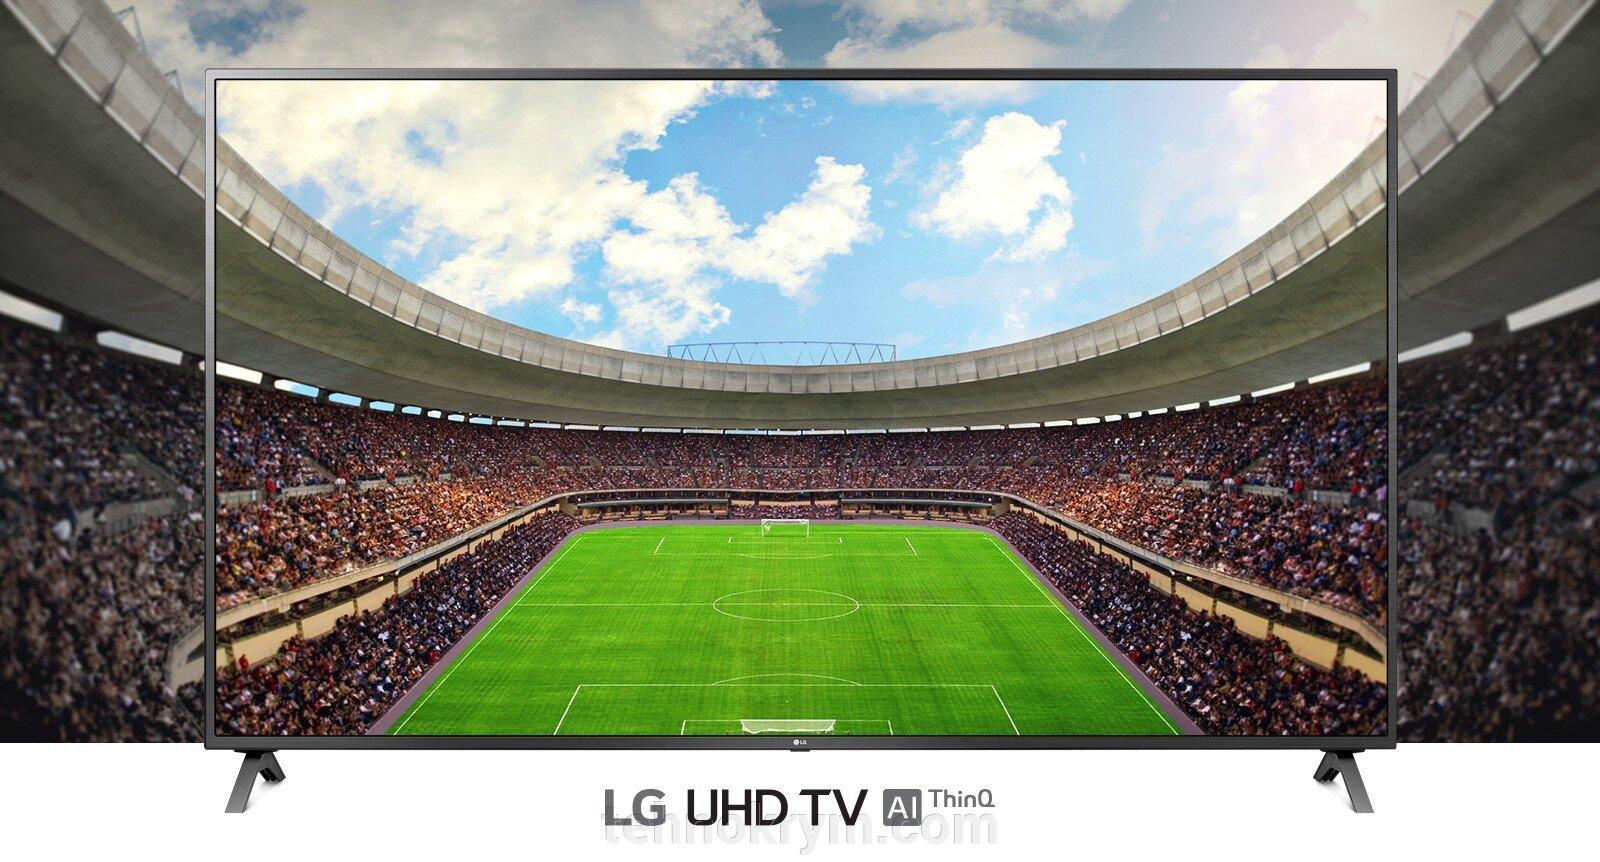 Smart телевизор LG 43UN71006LB, Ultra HD, черный, webOS 5.0 - фото pic_2d022484dcba64aec5181ba87d7d7394_1920x9000_1.jpg